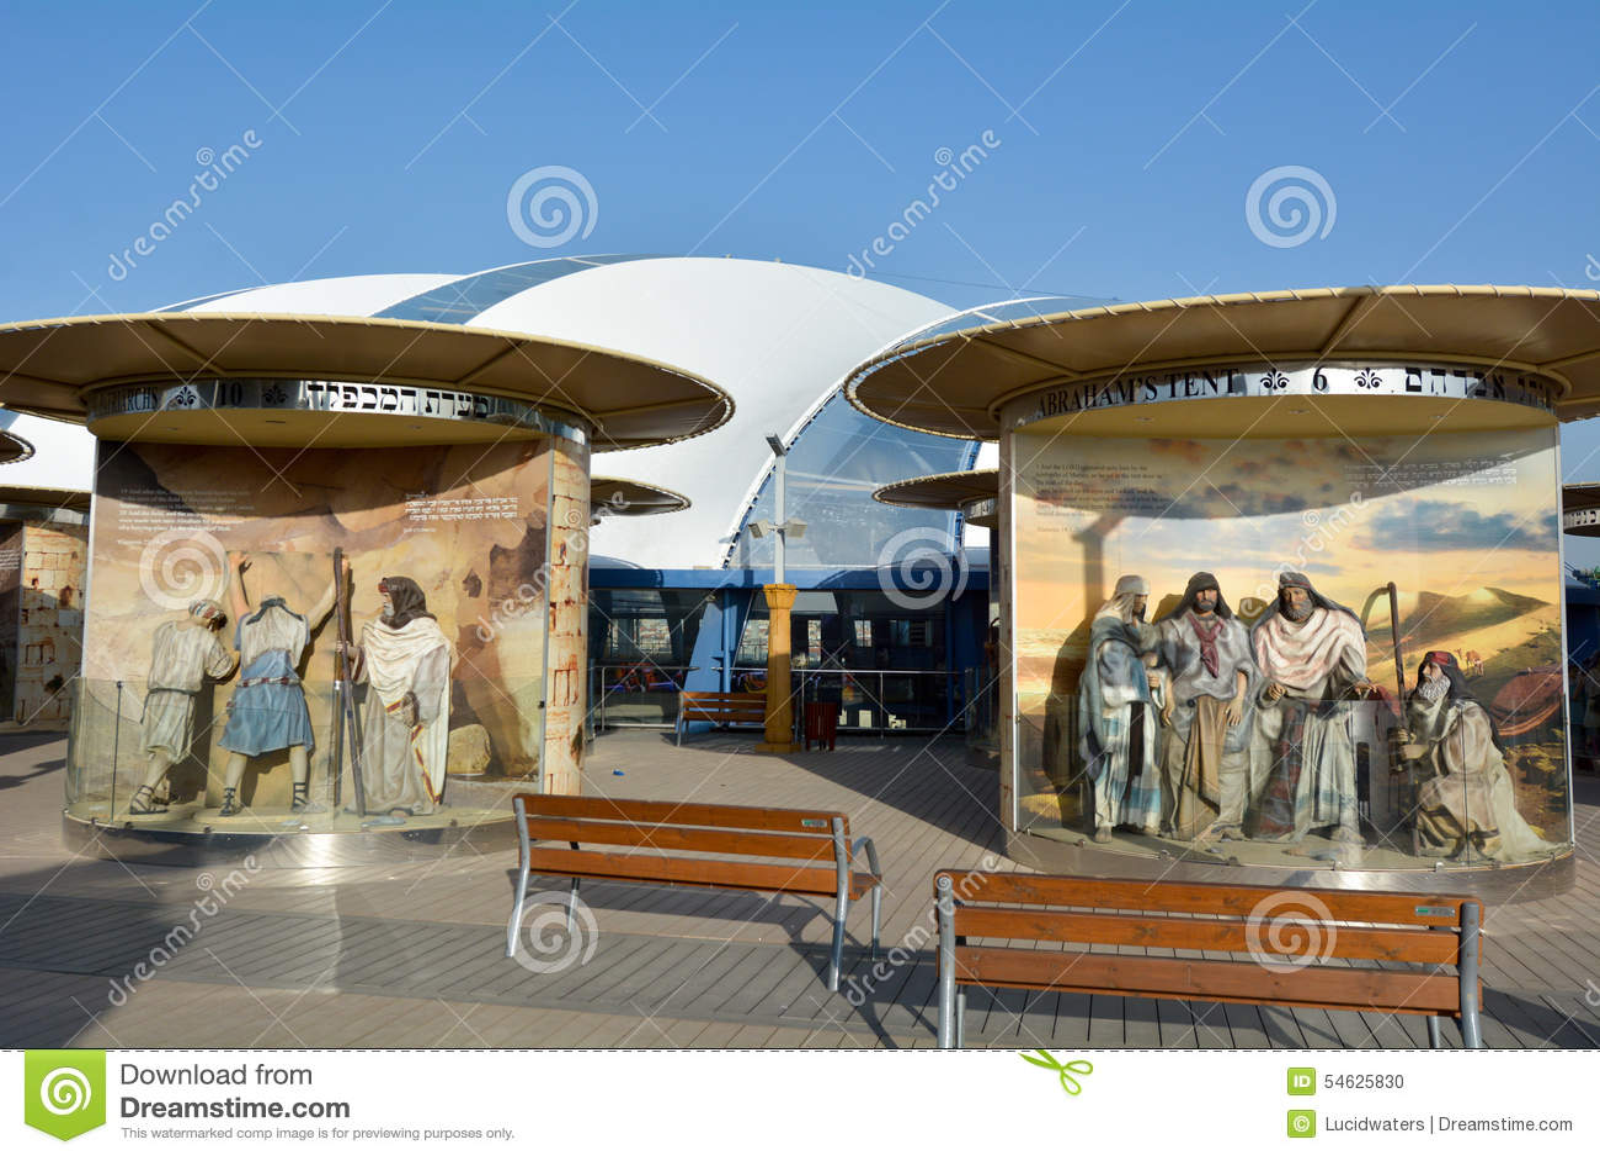 Cinema City In Jerusalem Israel Editorial Image - Image of